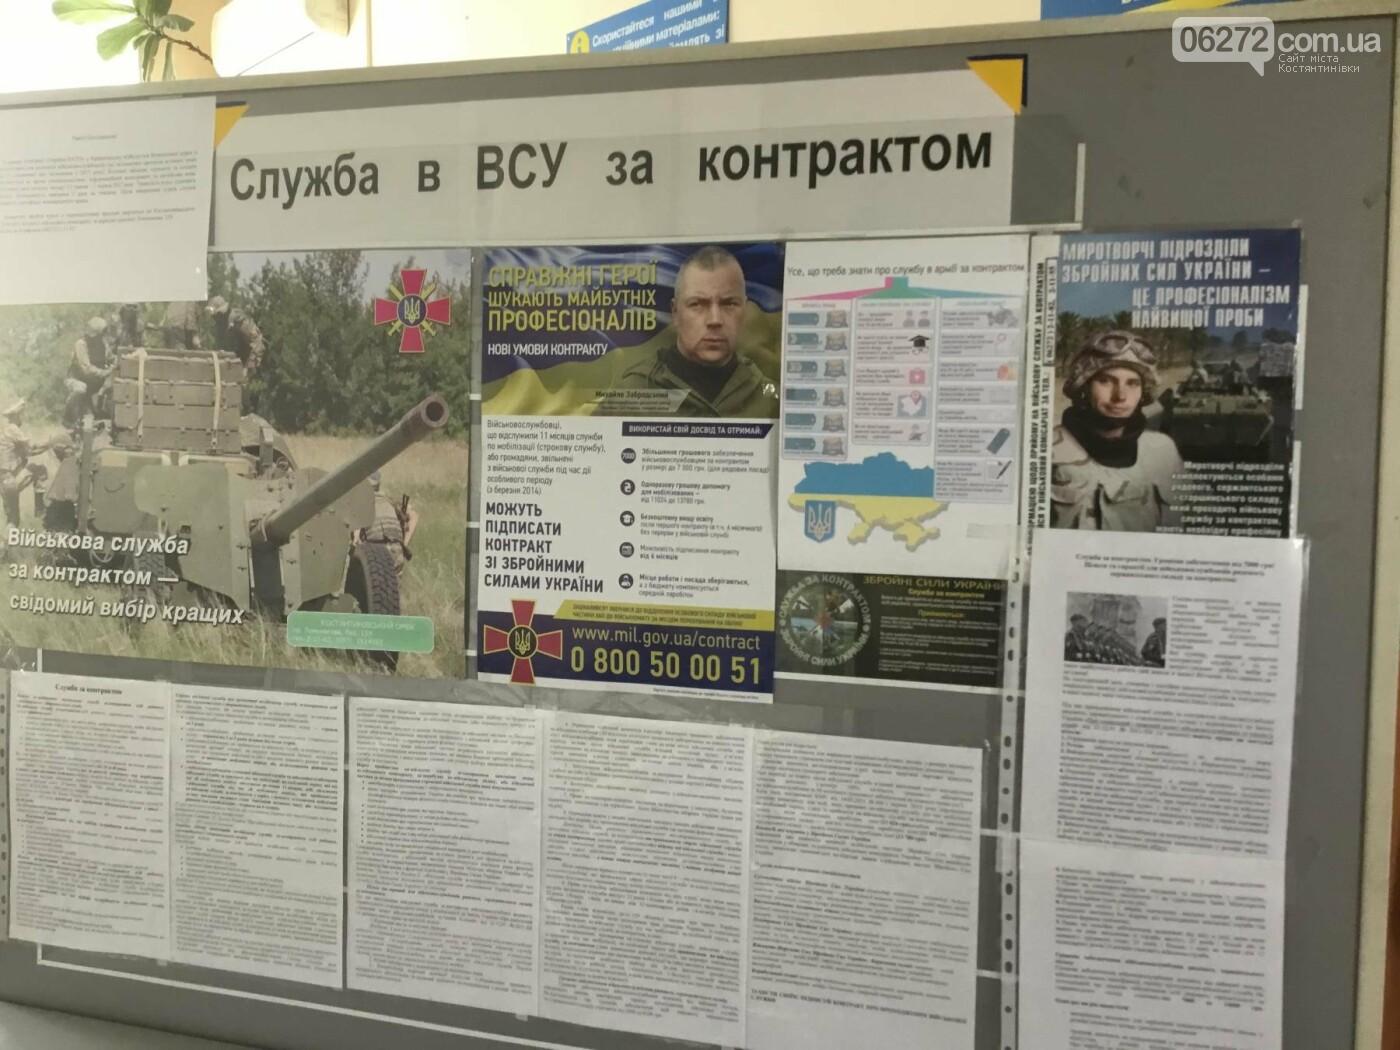 Константиновский центр занятости помогает в трудоустройстве бойцам АТО, фото-2